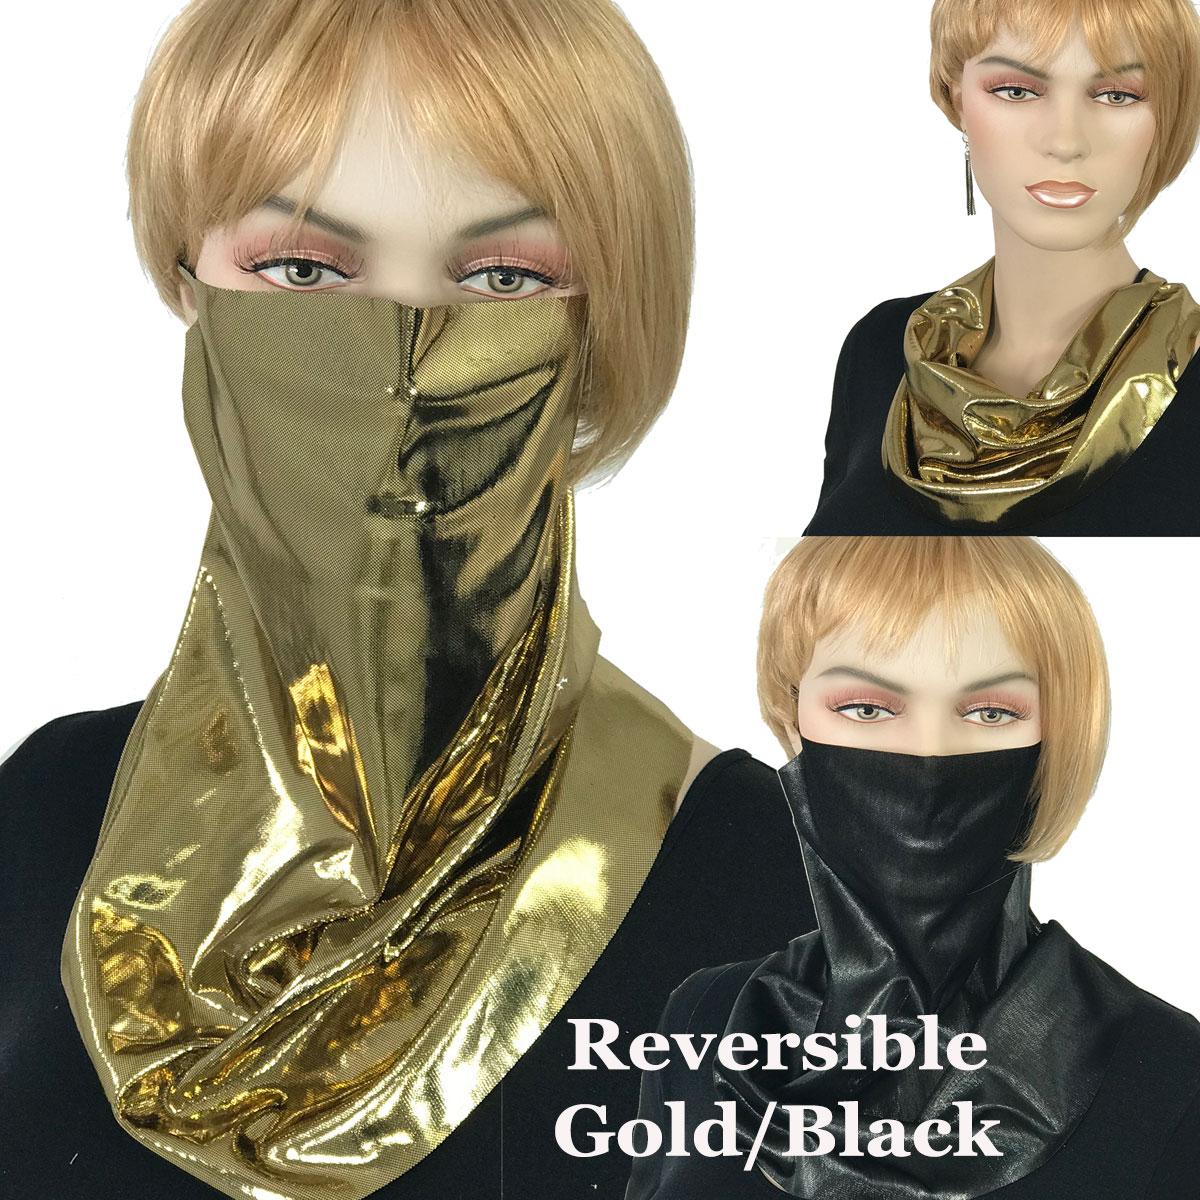 Protective Masks - Bling Styles - #02 Reversible Gold/Black Shimmer (Made in USA - Josefa) - Bling Masks